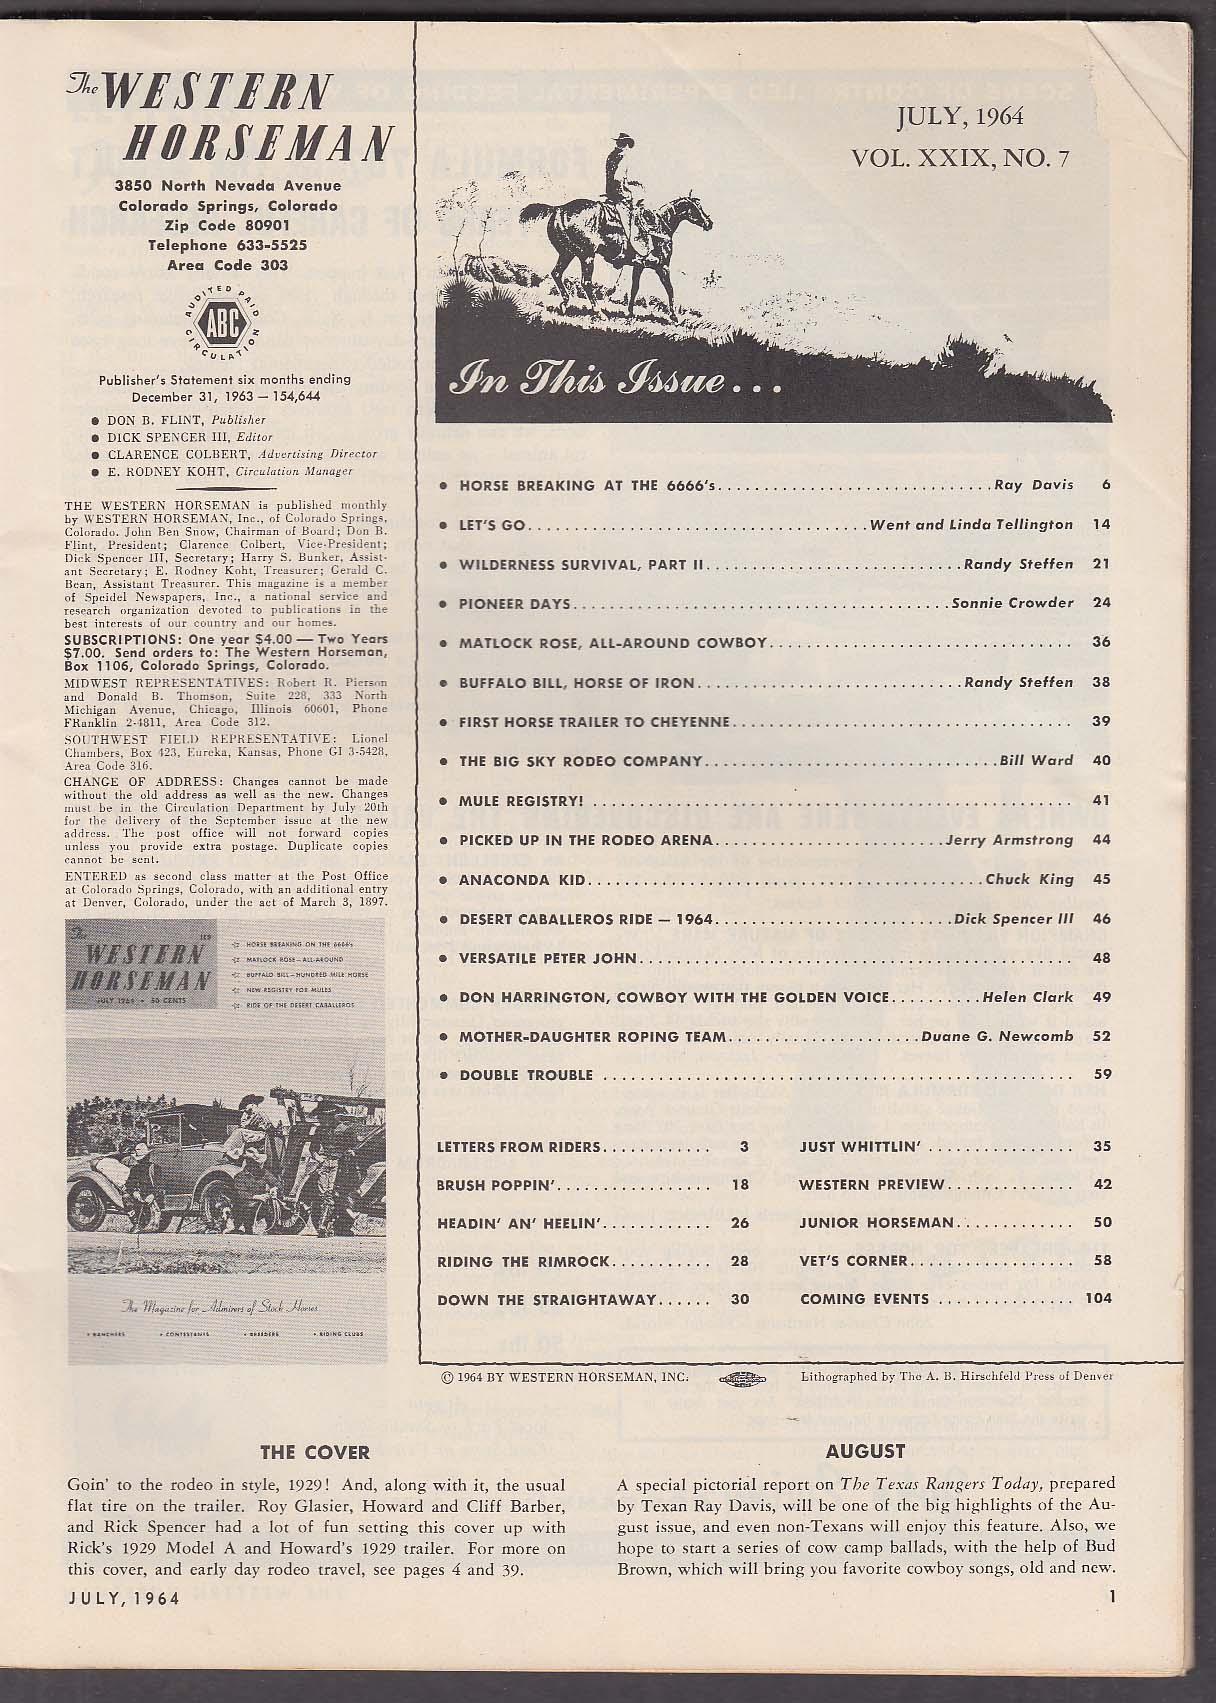 WESTERN HORSEMAN Matlock Rose Buffalo Bill Desert Caballeros 7 1964